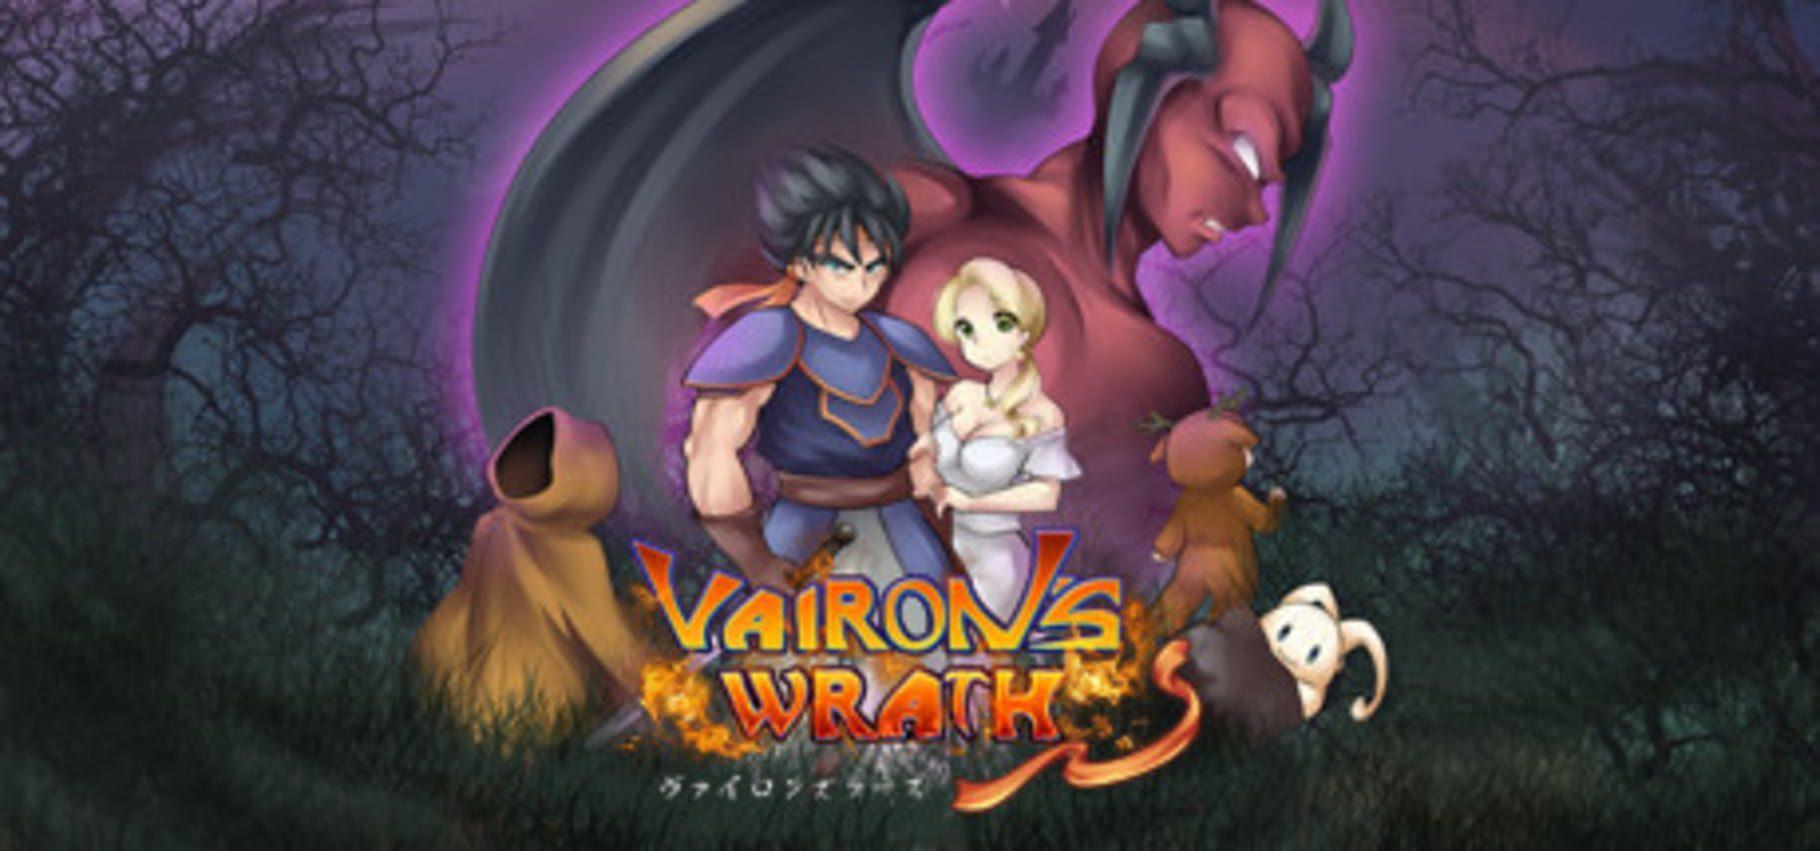 buy Vairon's Wrath cd key for all platform